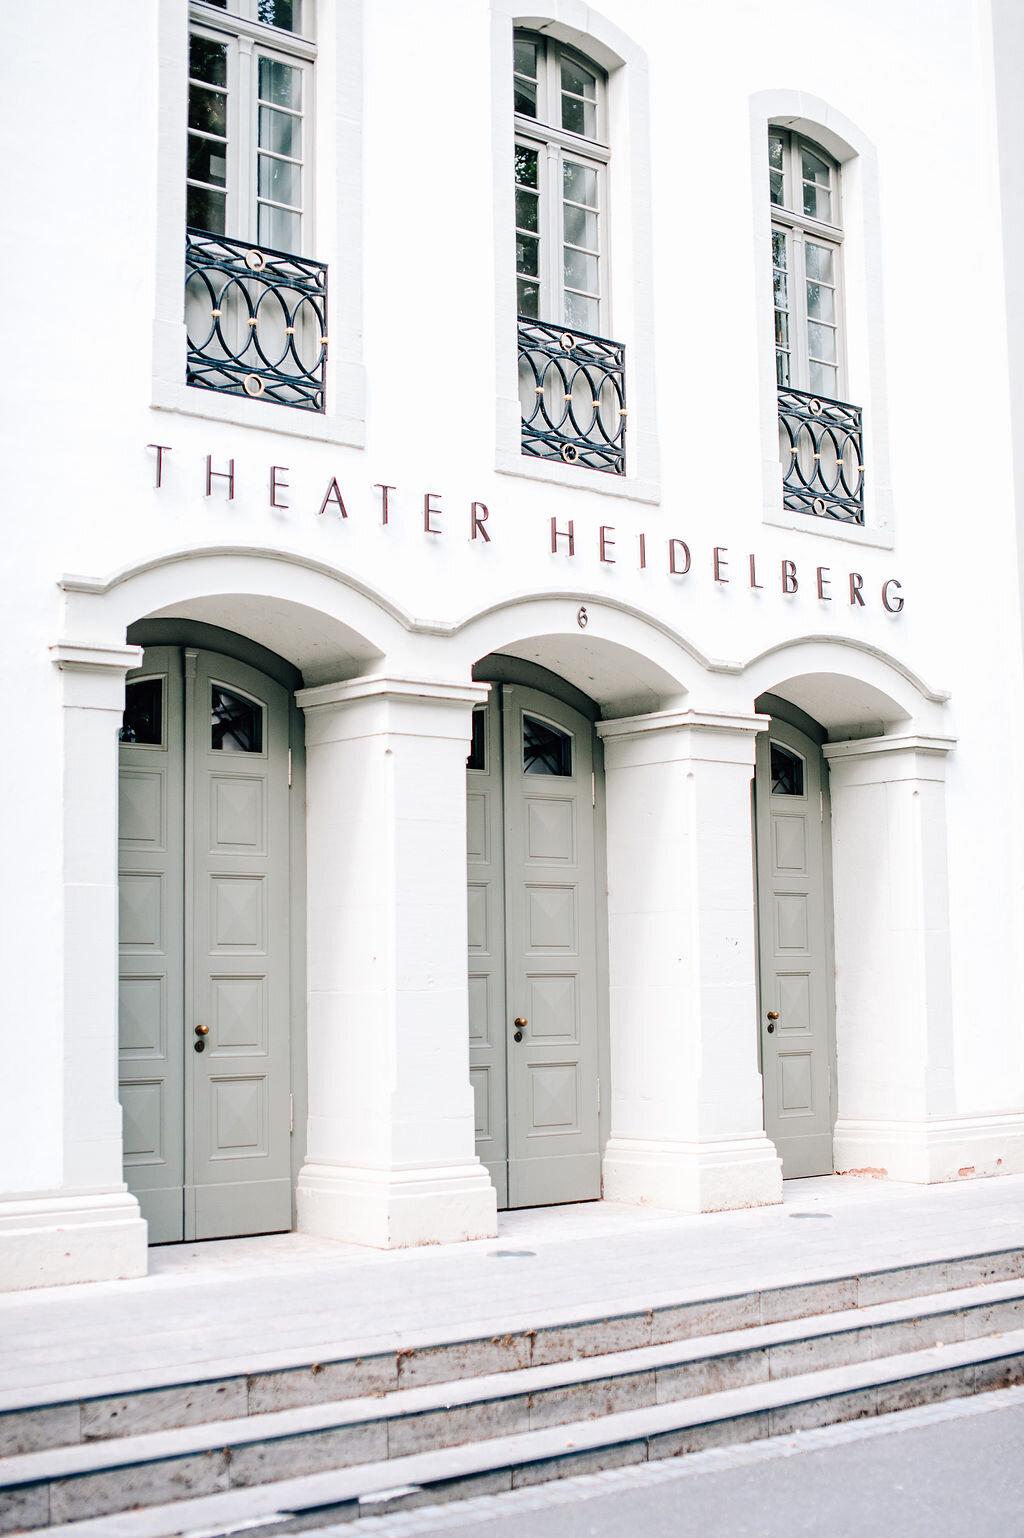 05-2019_Theater_JUM_4315.jpg